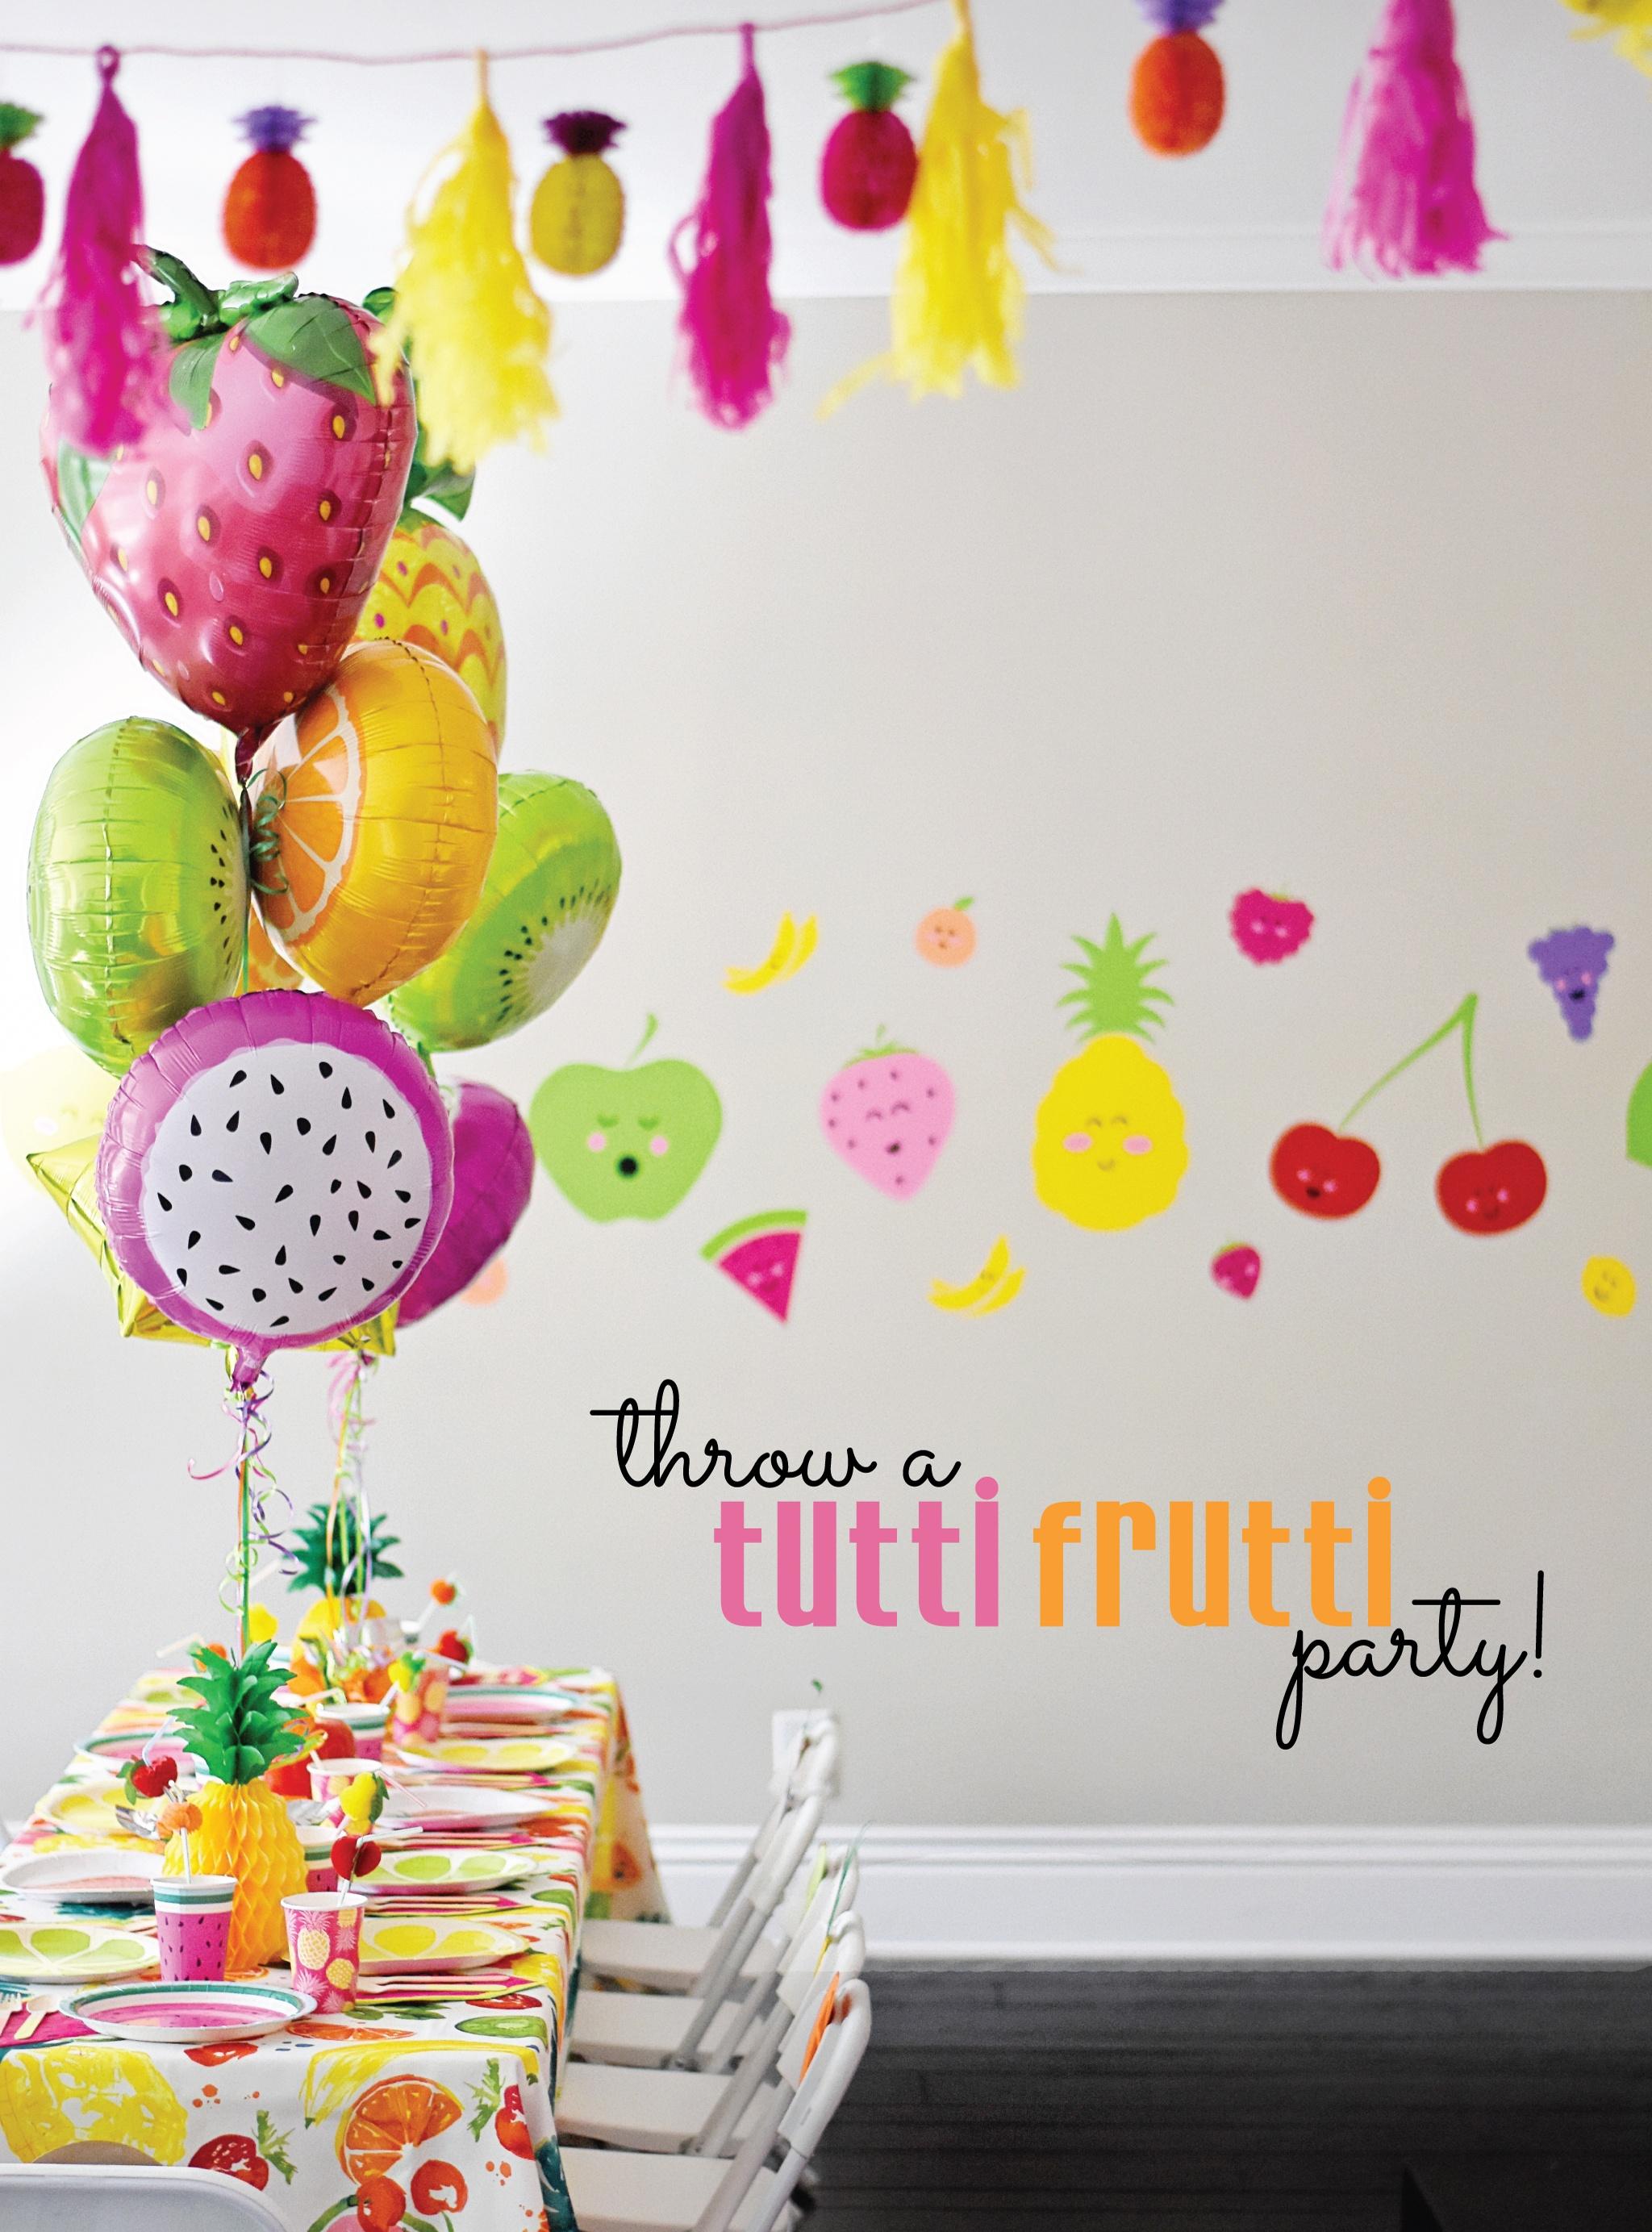 Cute And Colorful Tutti Frutti Birthday Party - Project Nursery - Tutti Frutti Free Printables